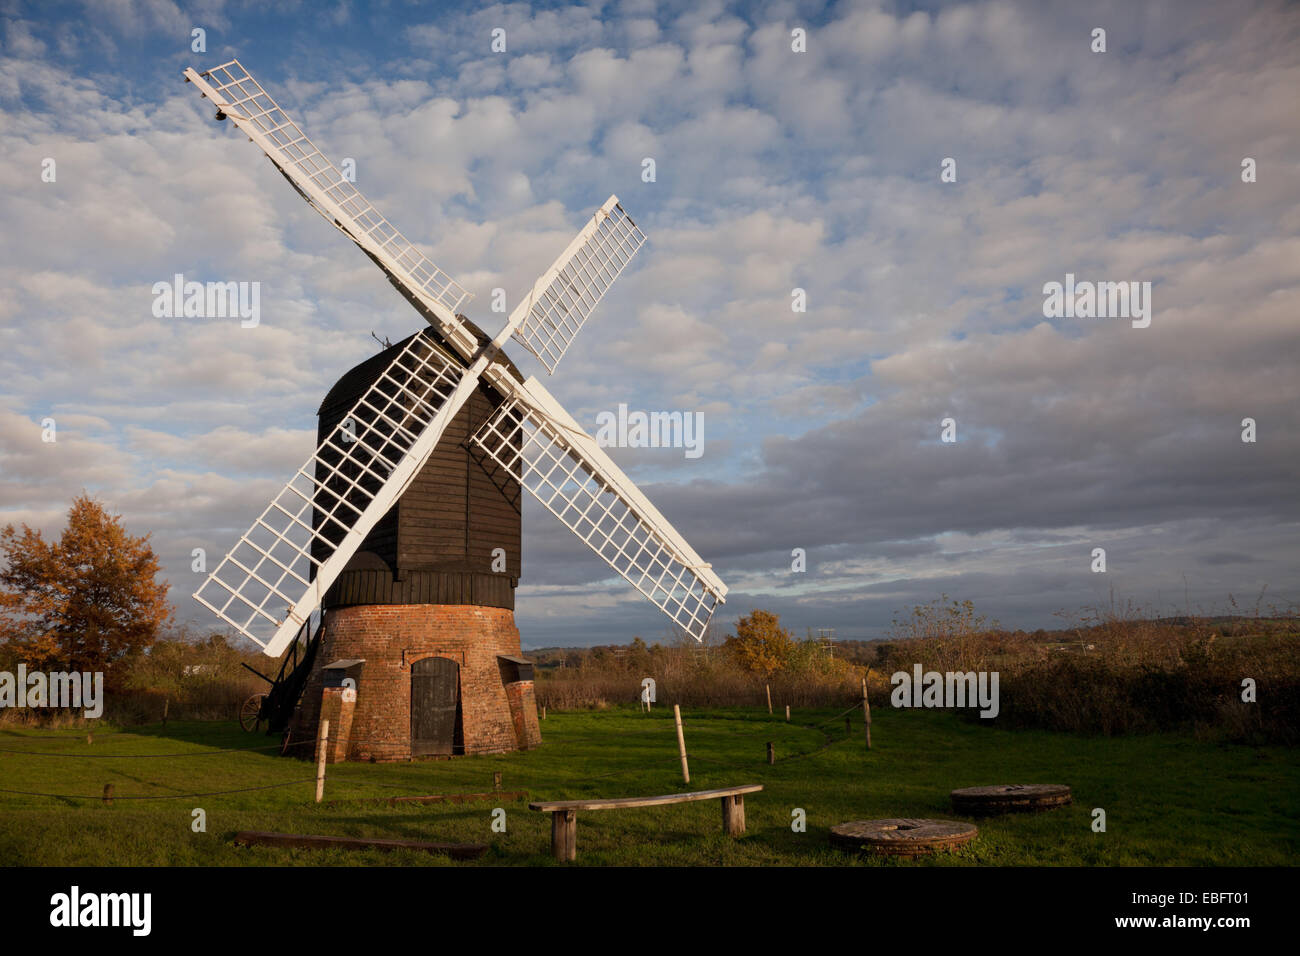 Windmill in Avoncroft museum, Bromsgrove Worcestershire UK - Stock Image